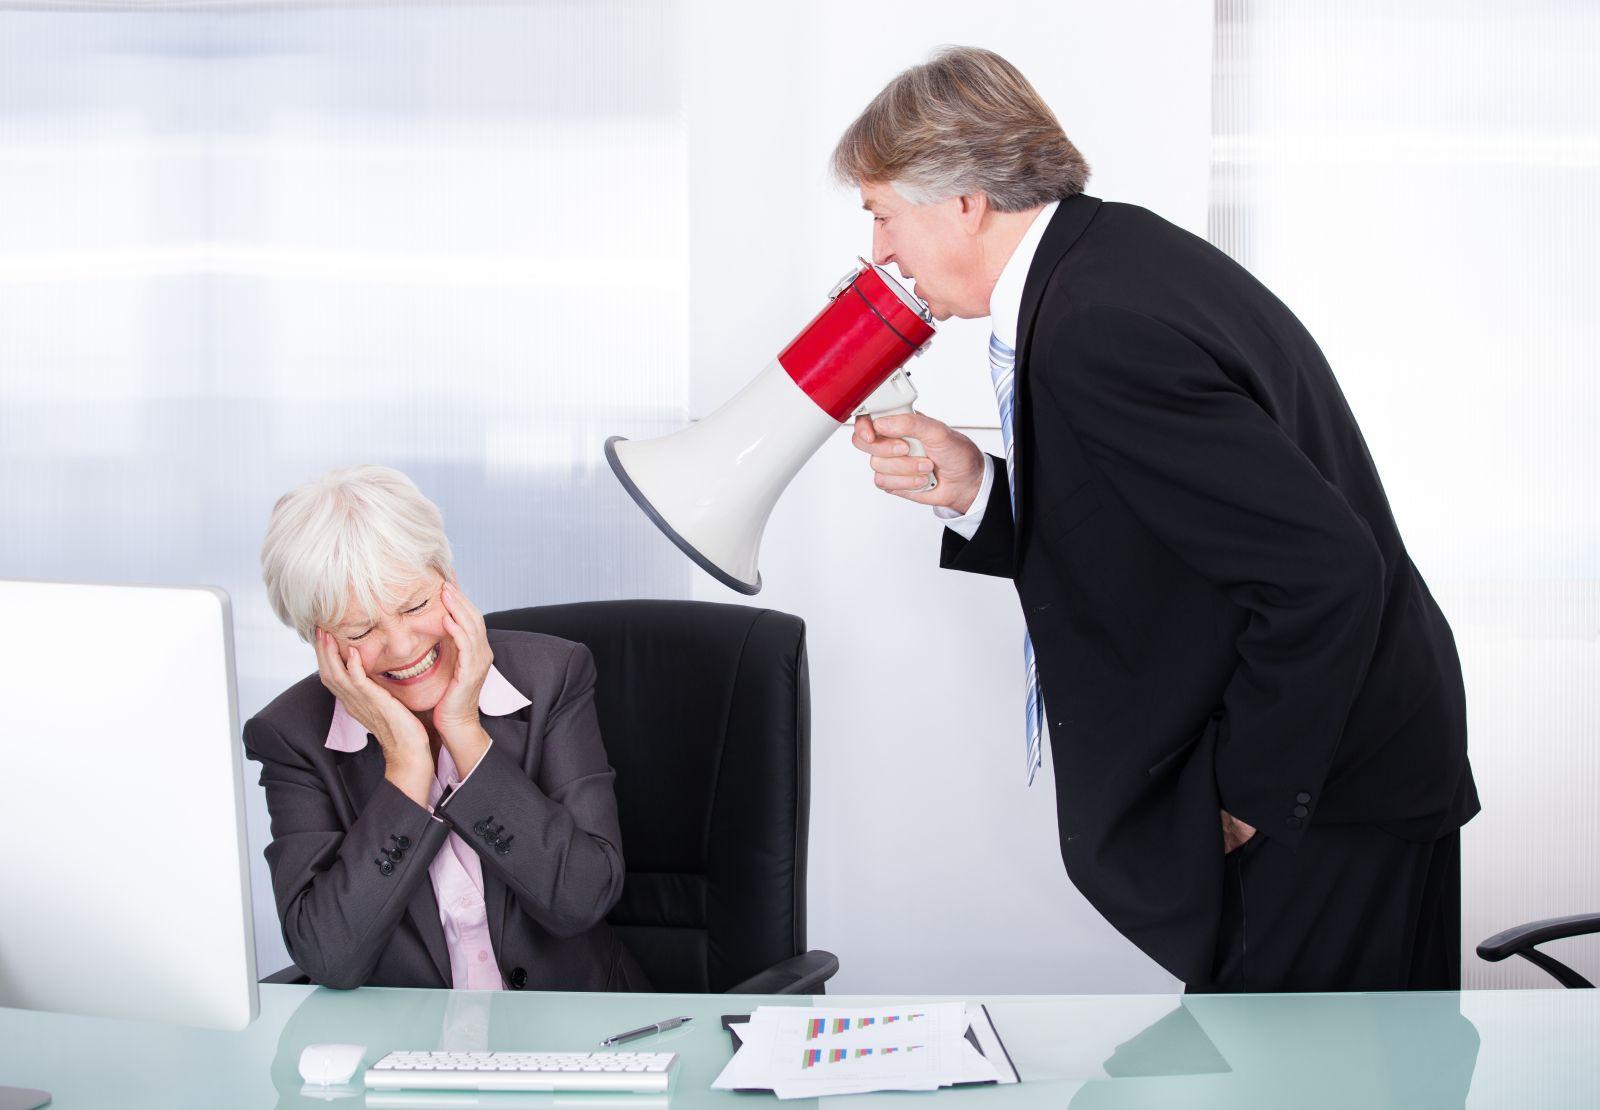 noisy workplace cardiovascular disease